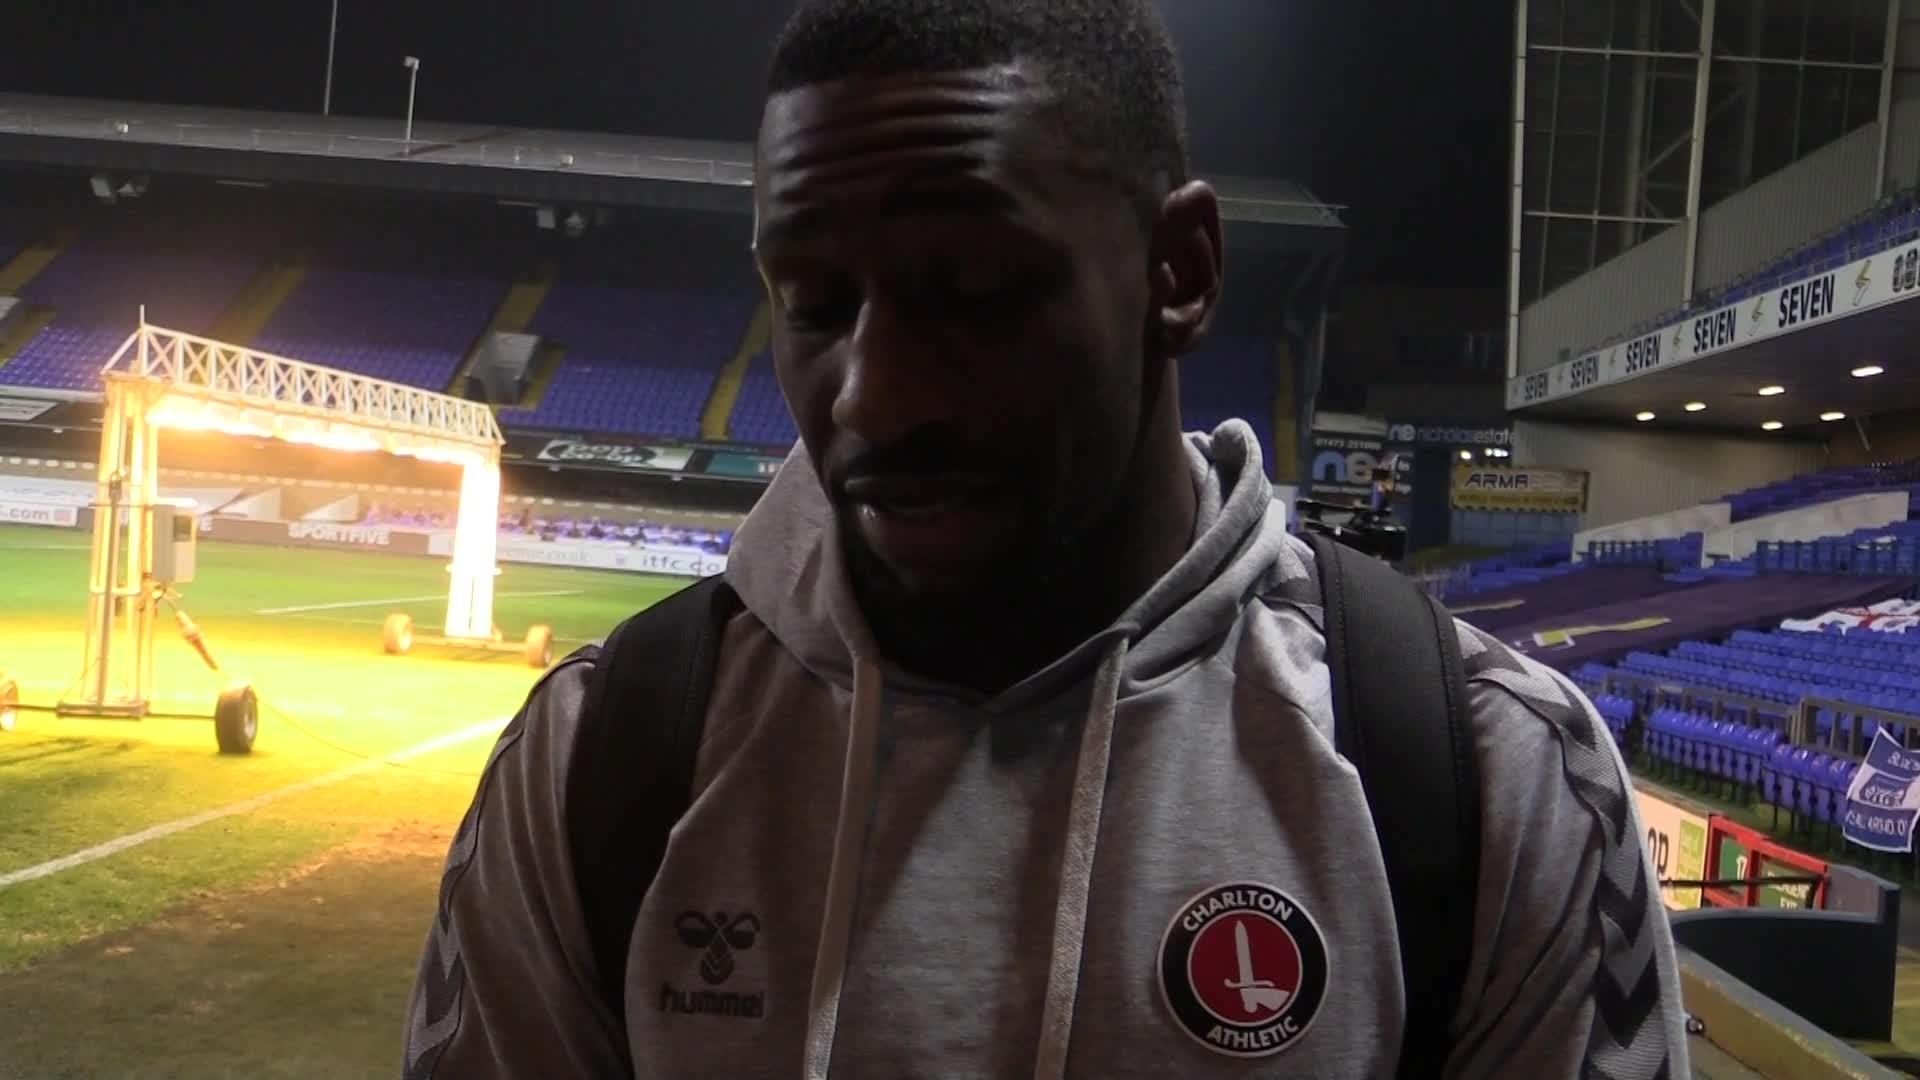 Goalscorer Bogle speaks following victory over Ipswich Town (November 2020)